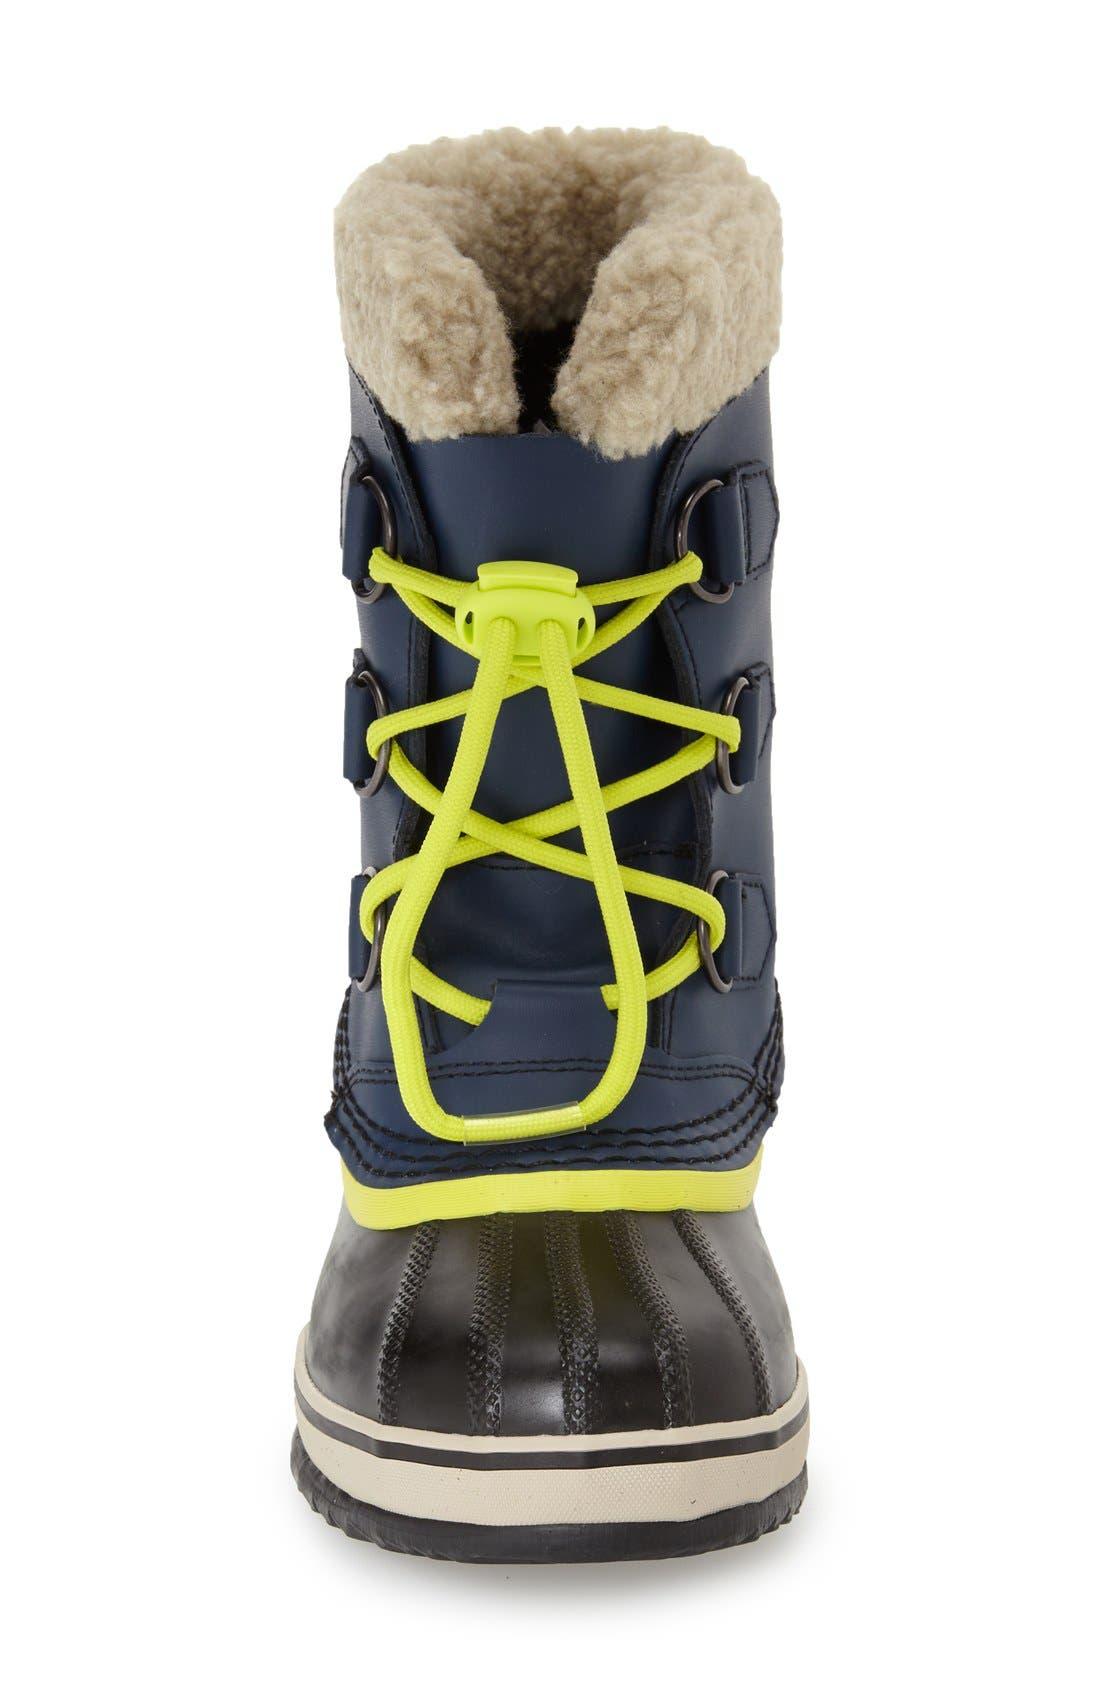 Alternate Image 3  - SOREL 'Yoot Pac' Waterproof Snow Boot (Toddler, Little Kid & Big Kid)